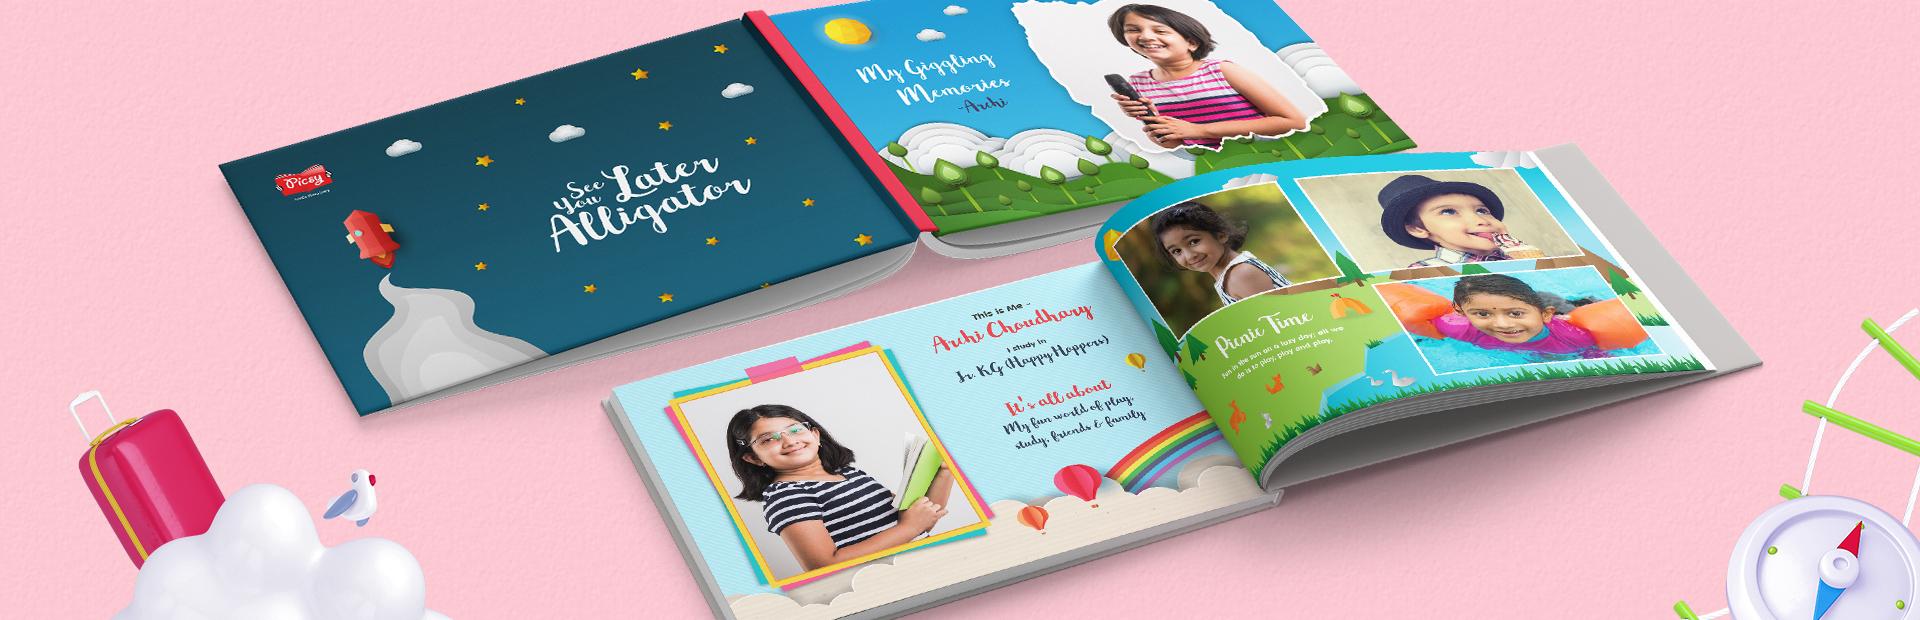 Kidstar Photo Books Online